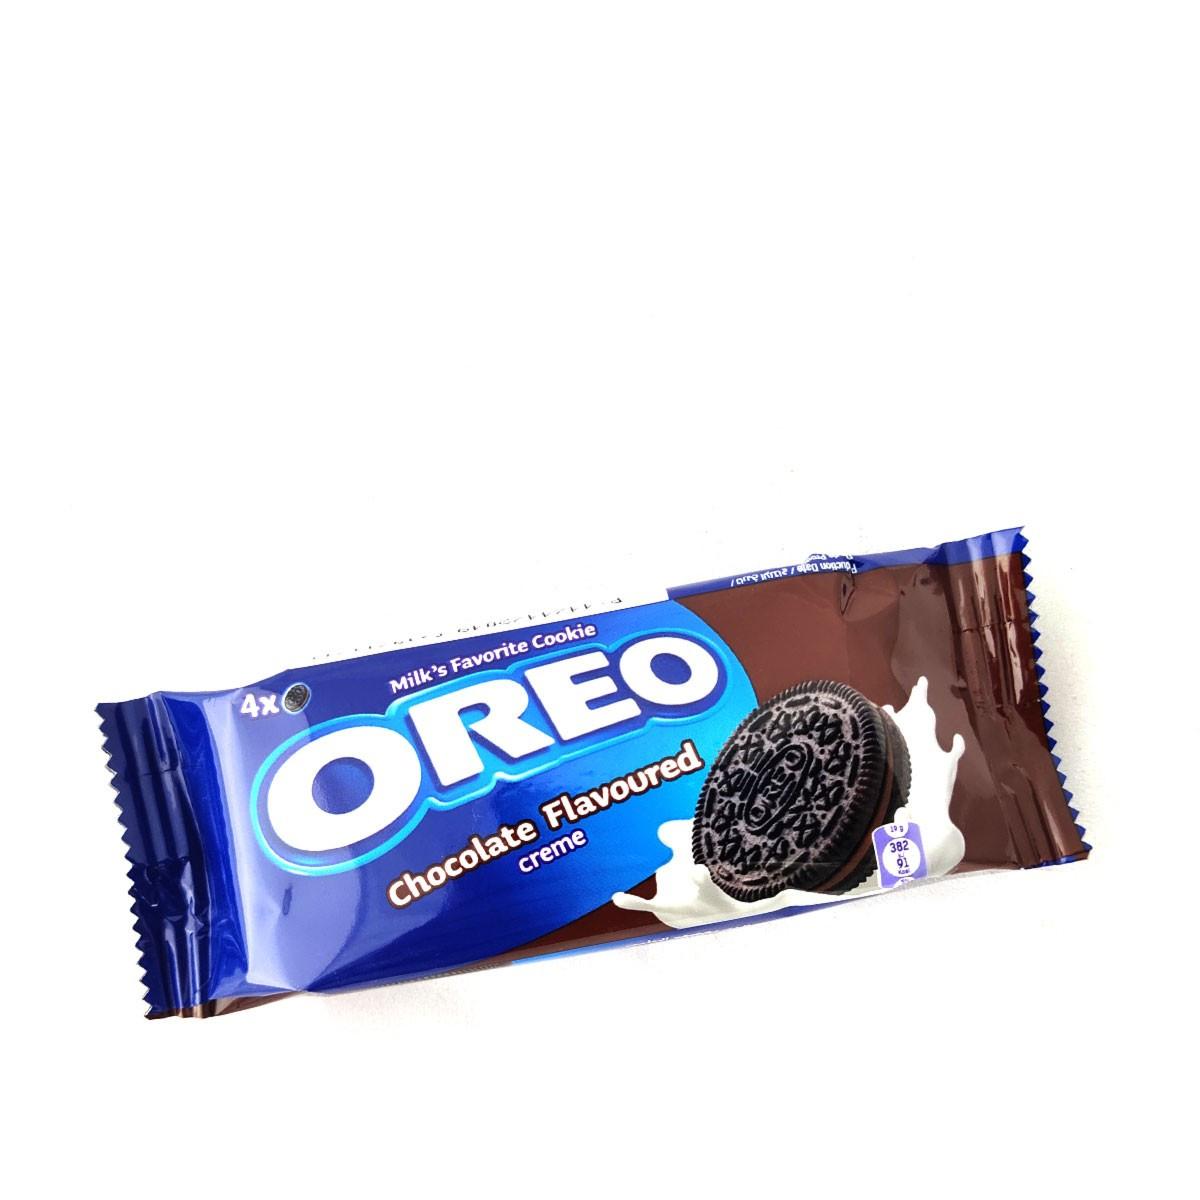 Печенье Oreo Chocolate cream 38гр 4шт Шоколадный крем (12шт-упак)